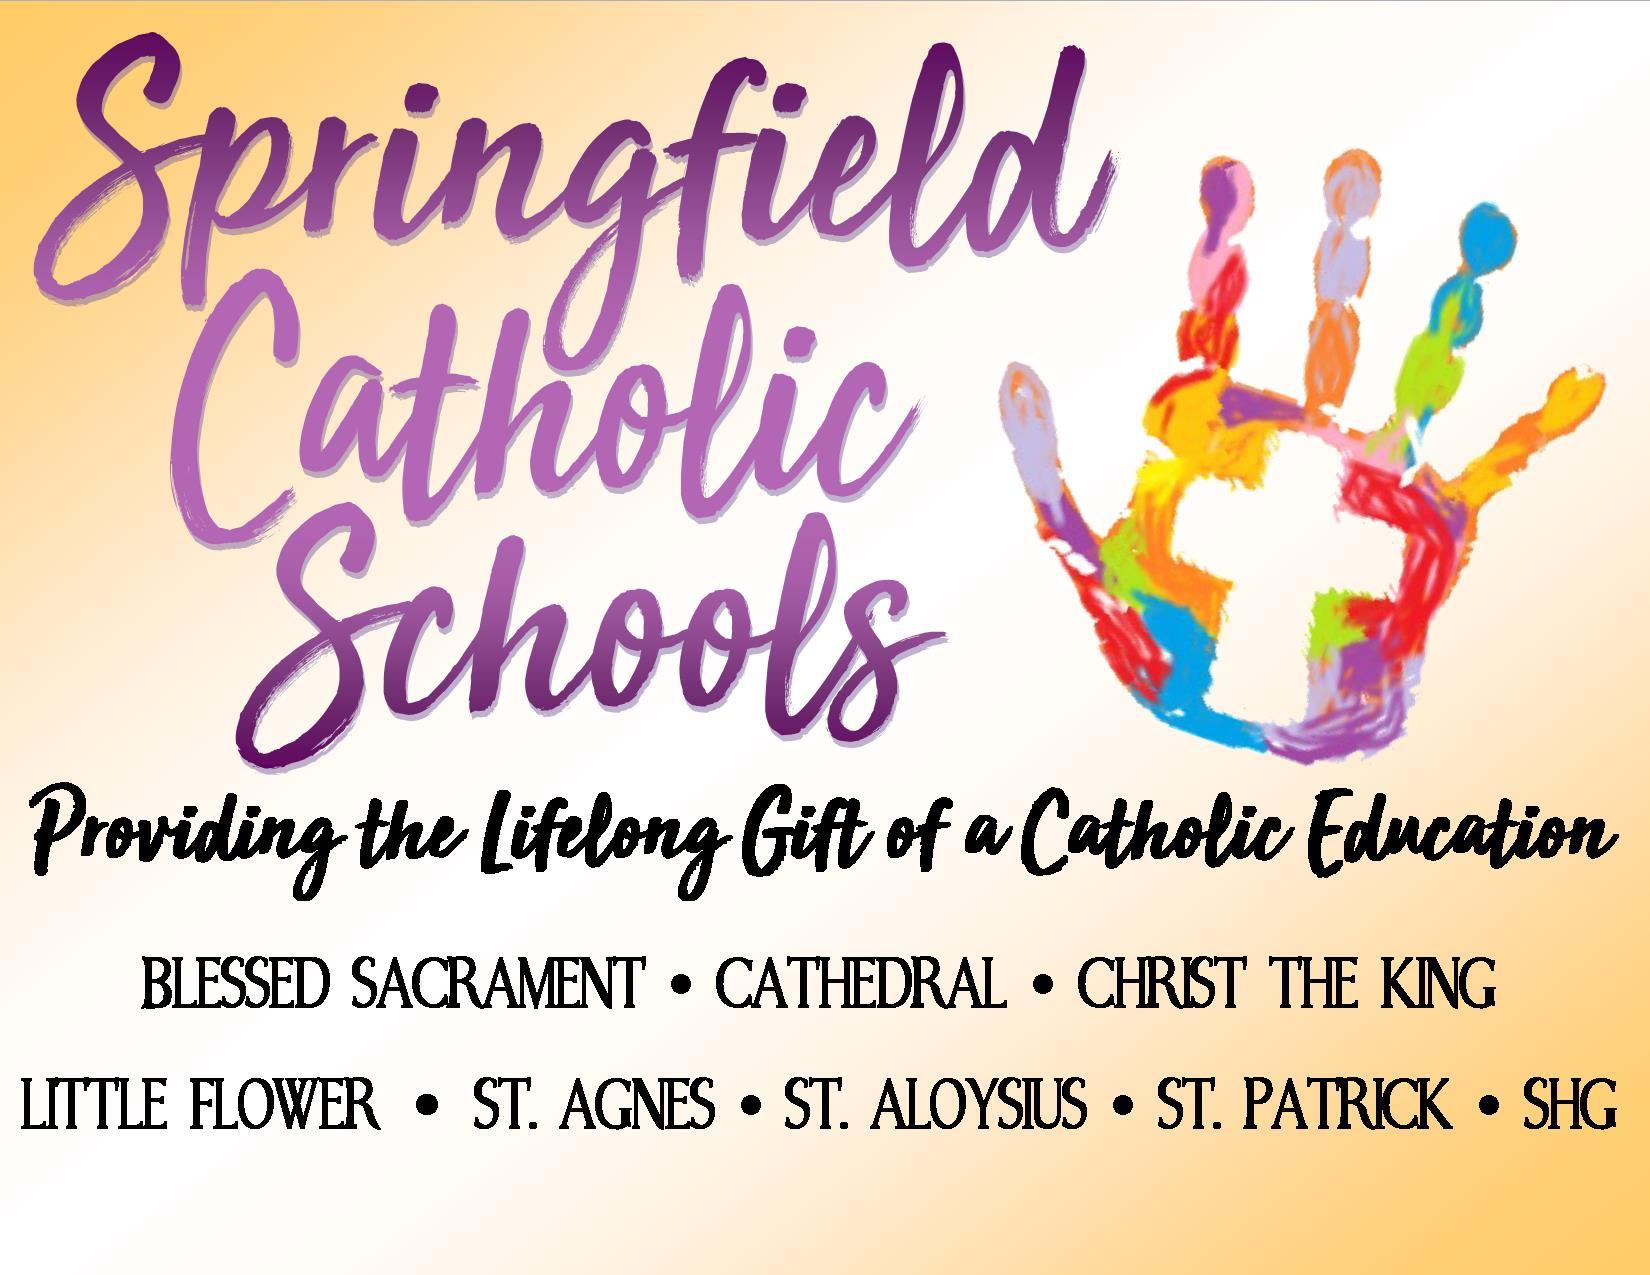 Springfield Catholic Schools 2018 -4